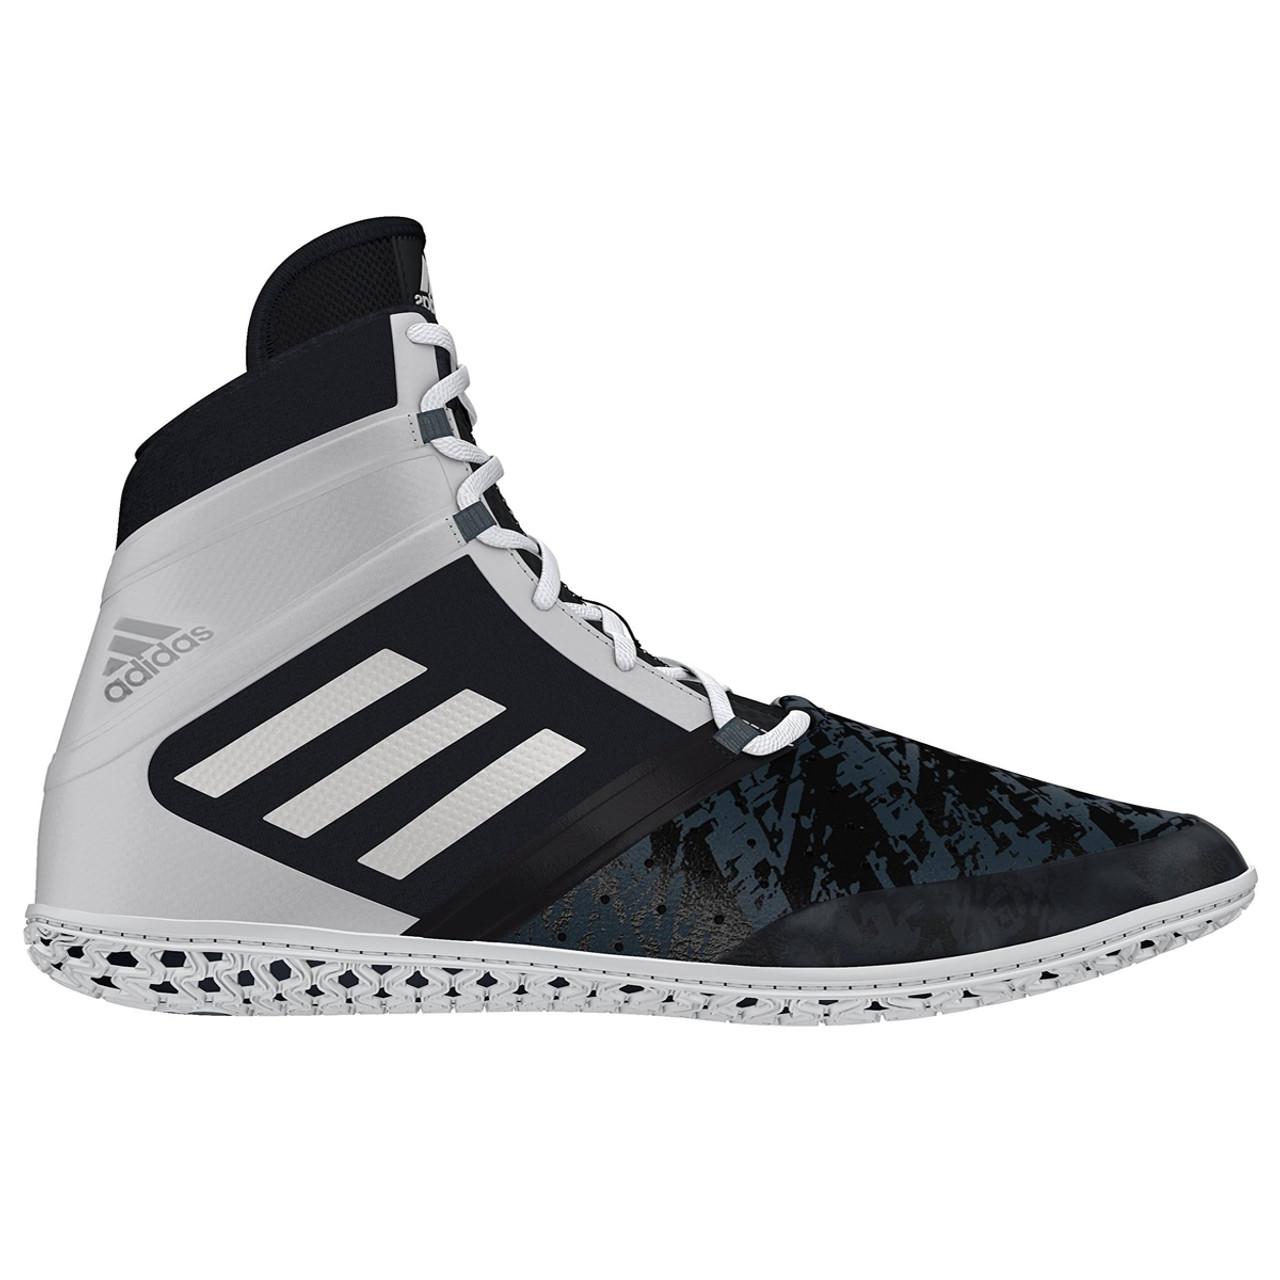 Adidas Impact Adult Wrestling Shoes AQ3317 - Black, White, Silver